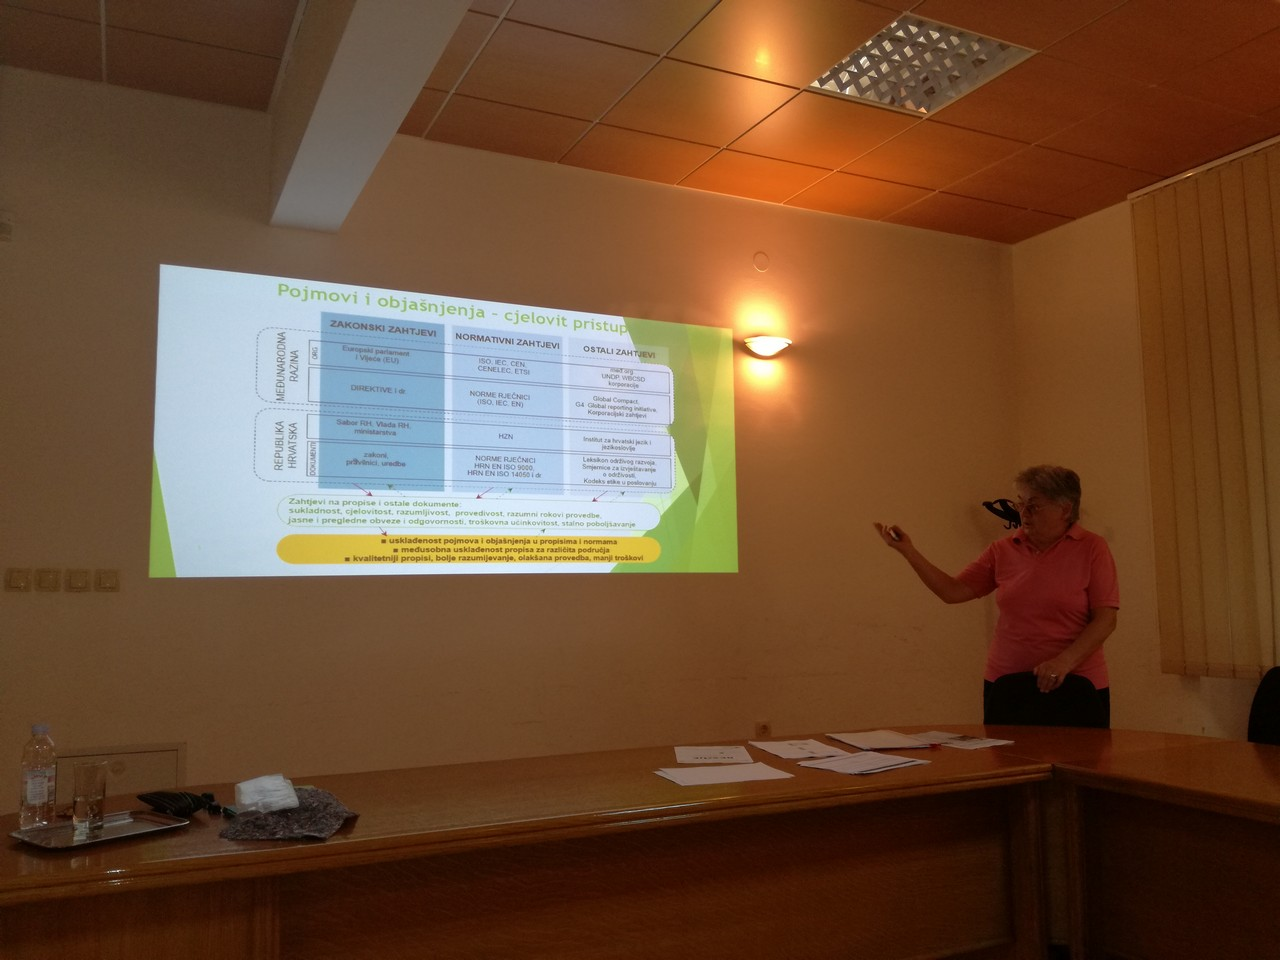 Interaktivno predavanje